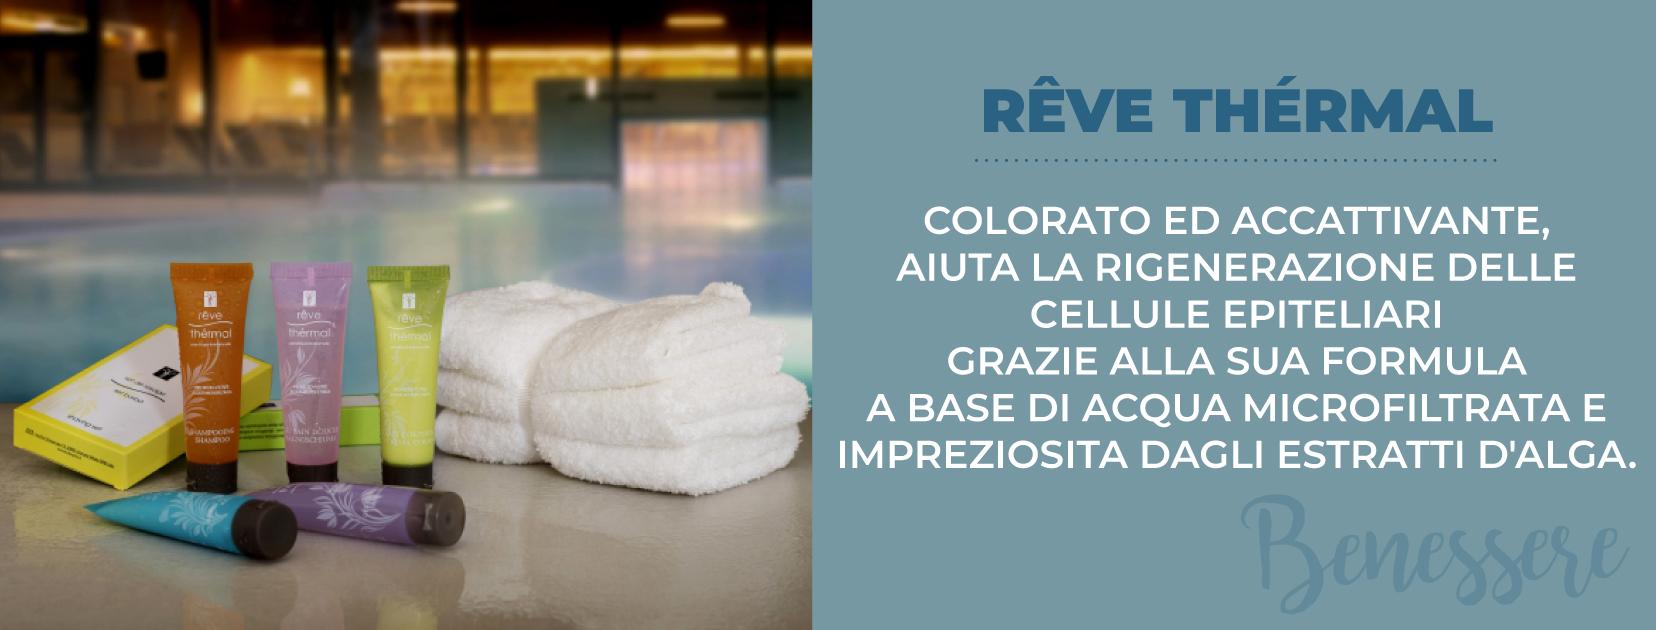 REVE SLIDER LINEA CORTESIA 1656x630